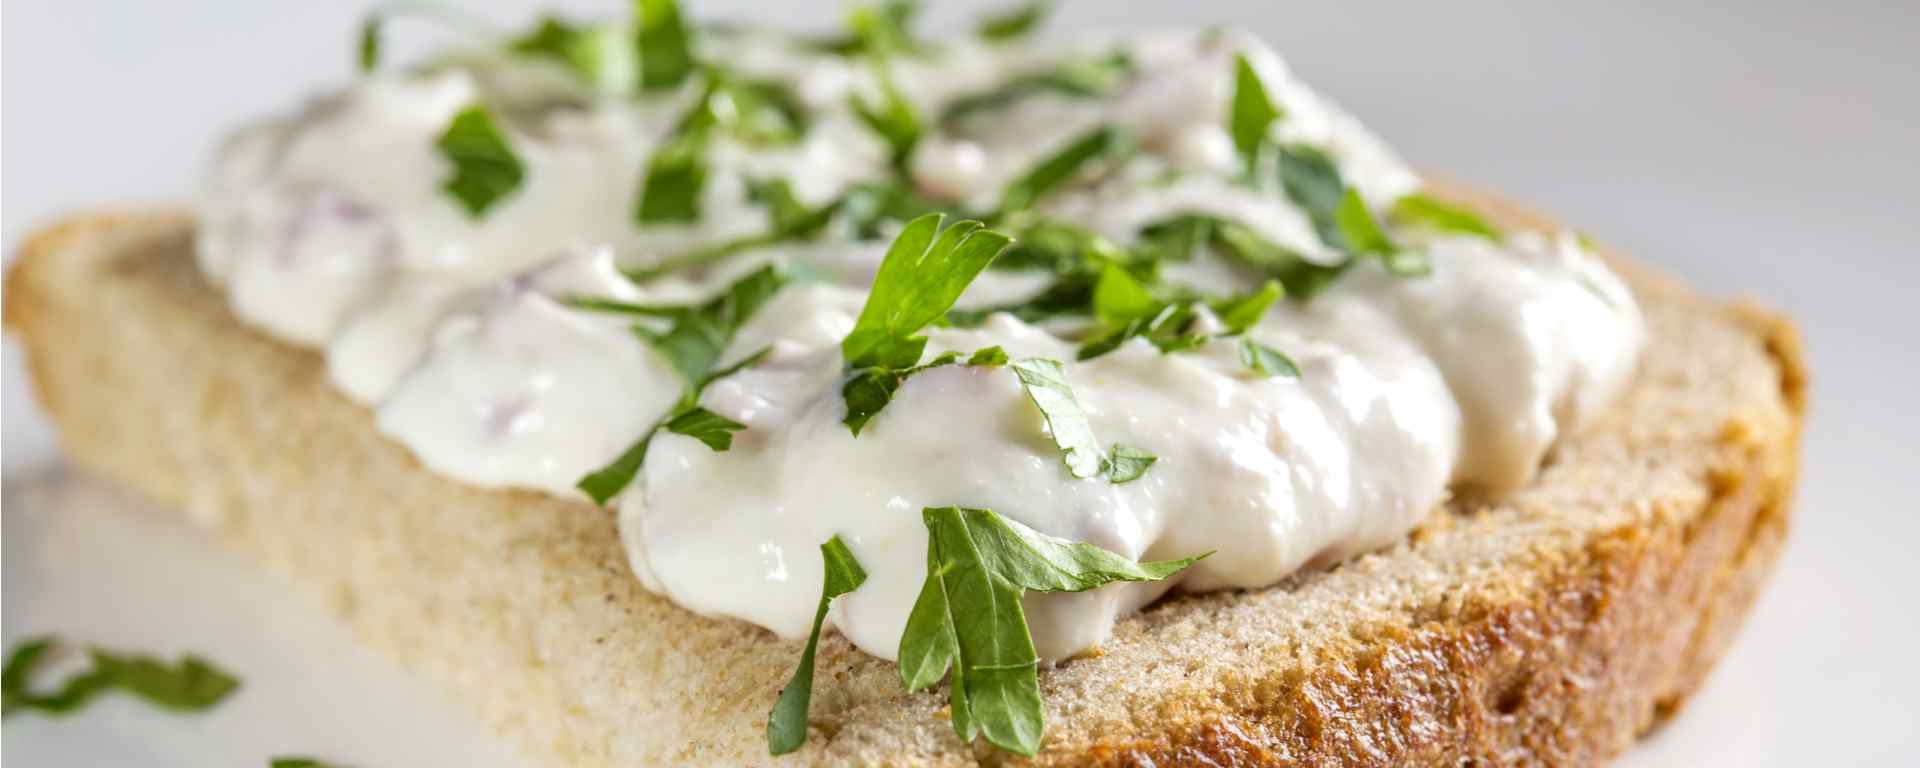 Photo for - Tangy Summer Horseradish